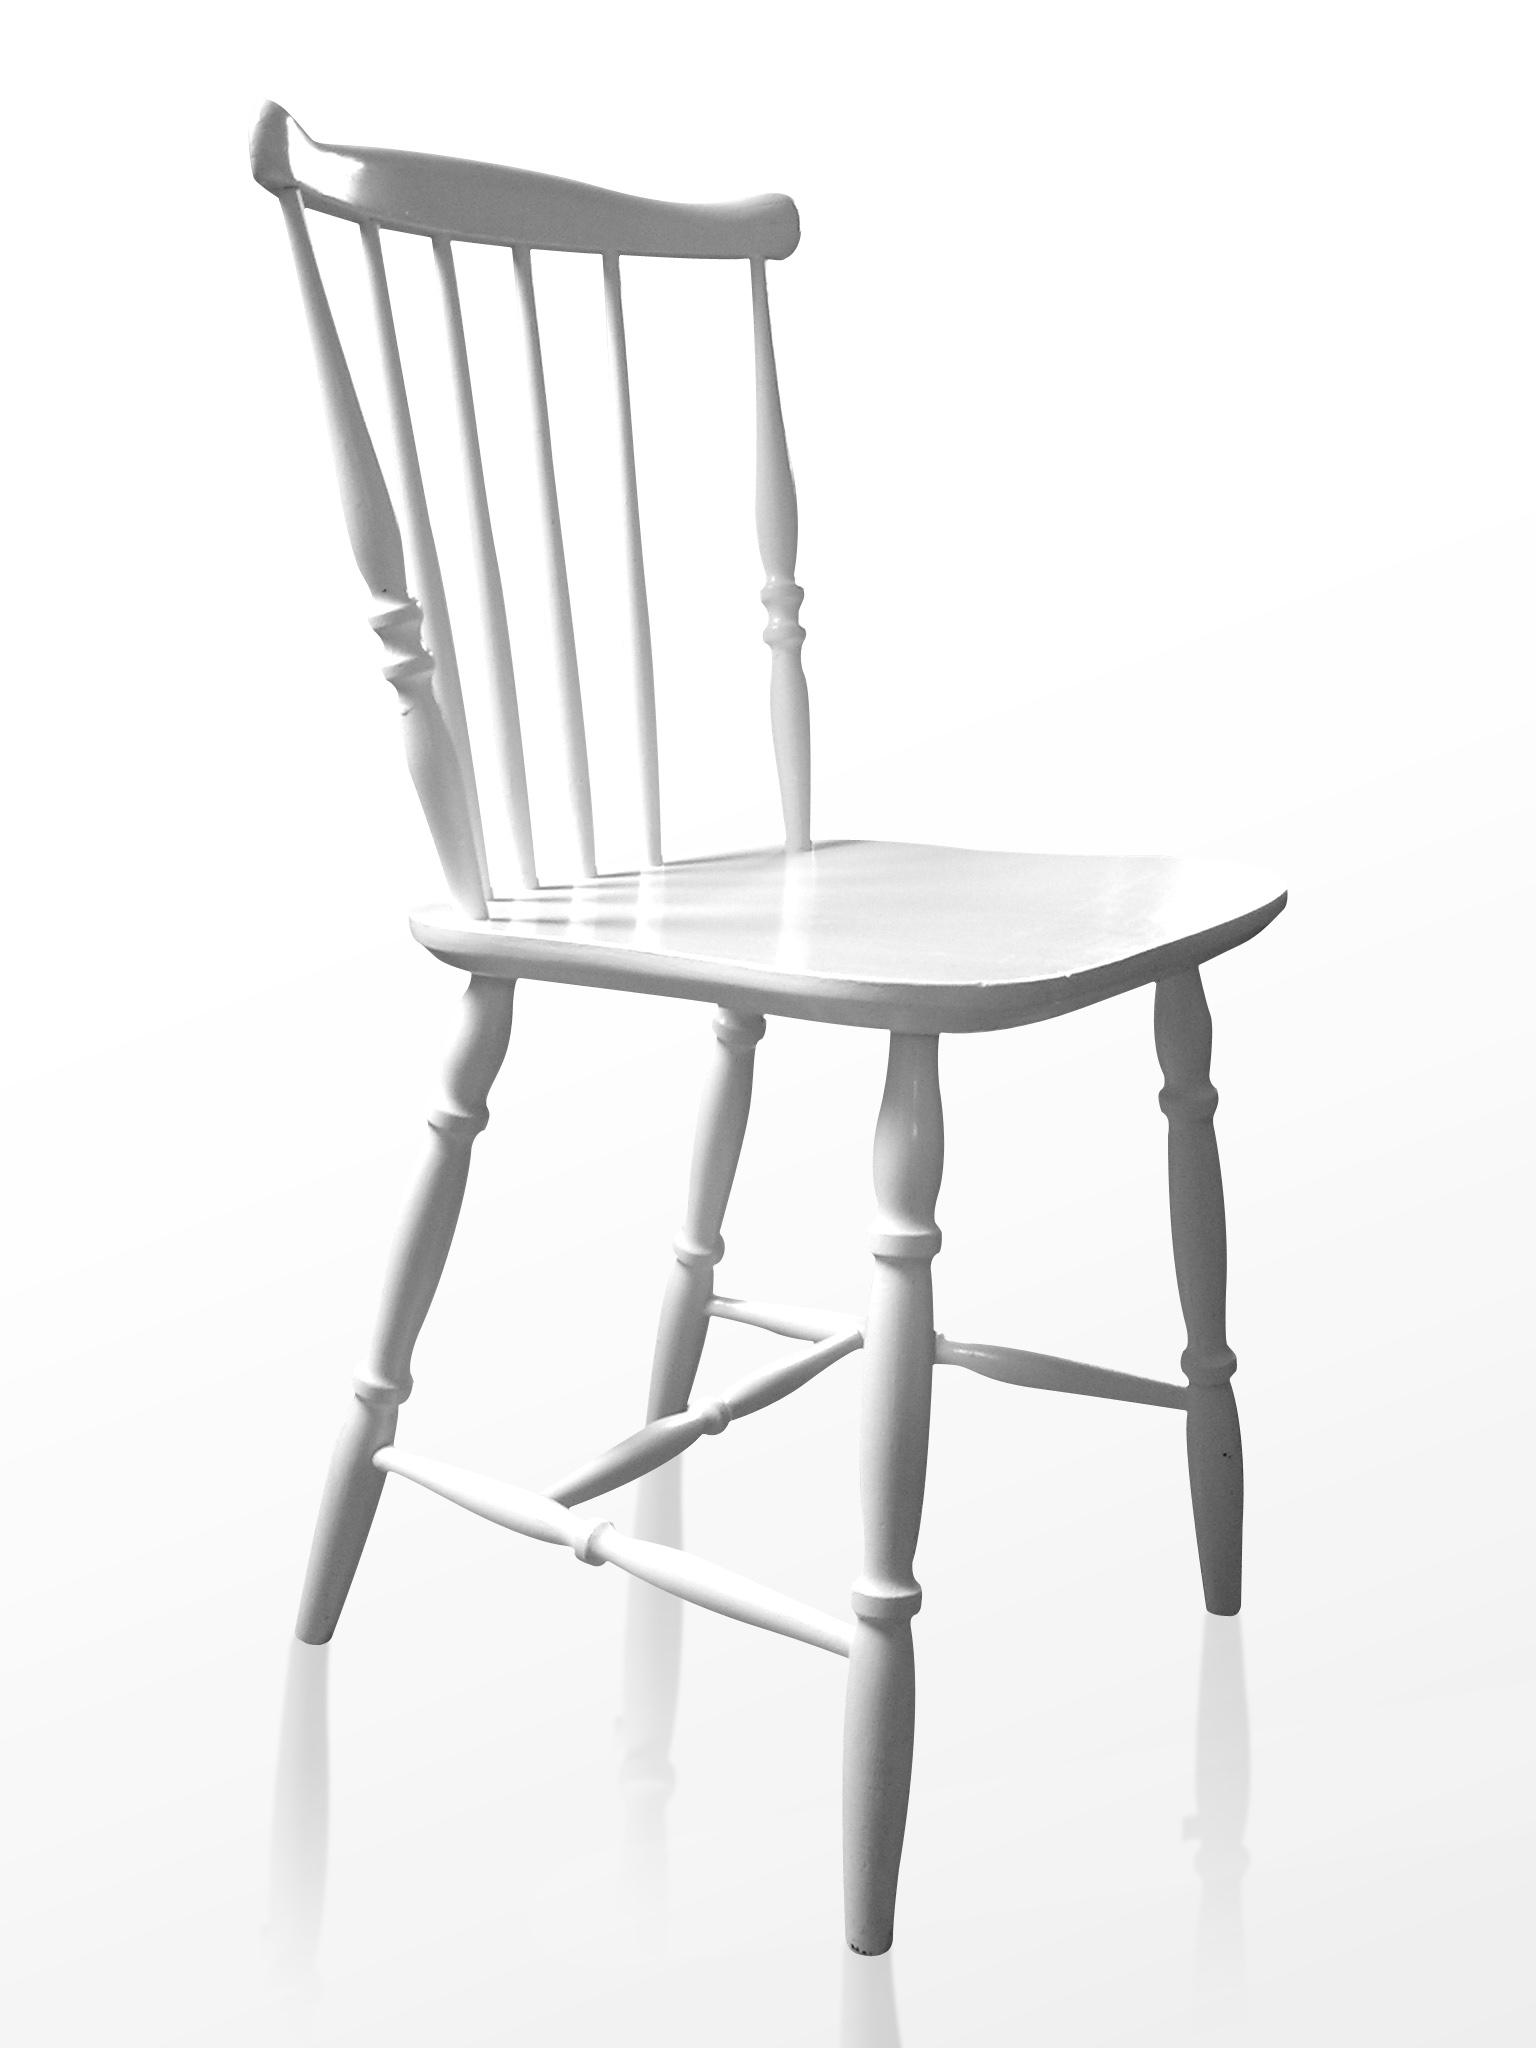 Rajeunir vos vieilles chaises bricolage blog - Vieille chaise en bois ...